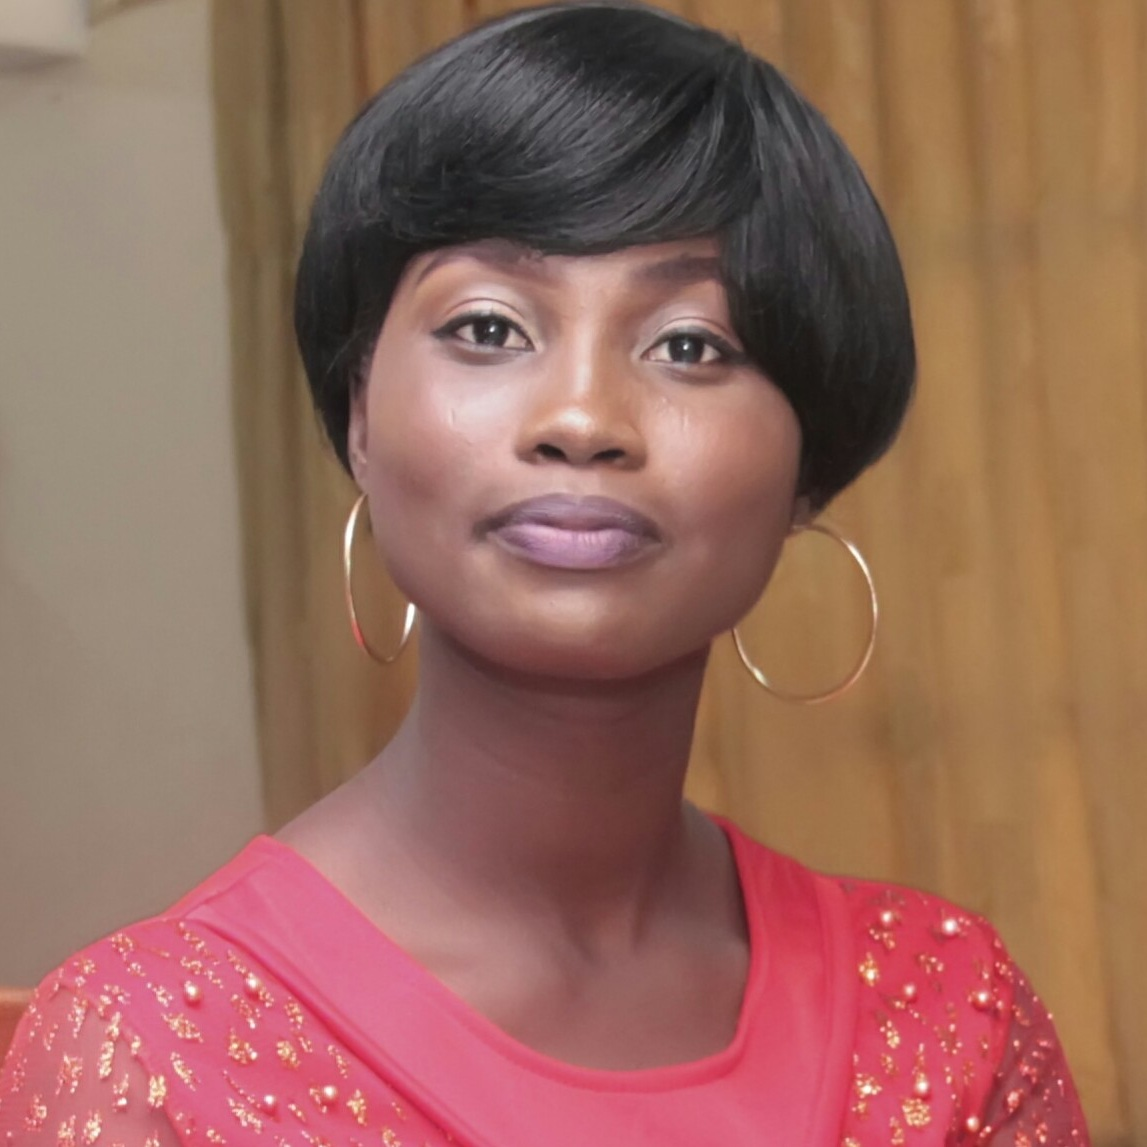 Taiwo_Olawehinmi - Taiwo Olawehinmi.jpeg